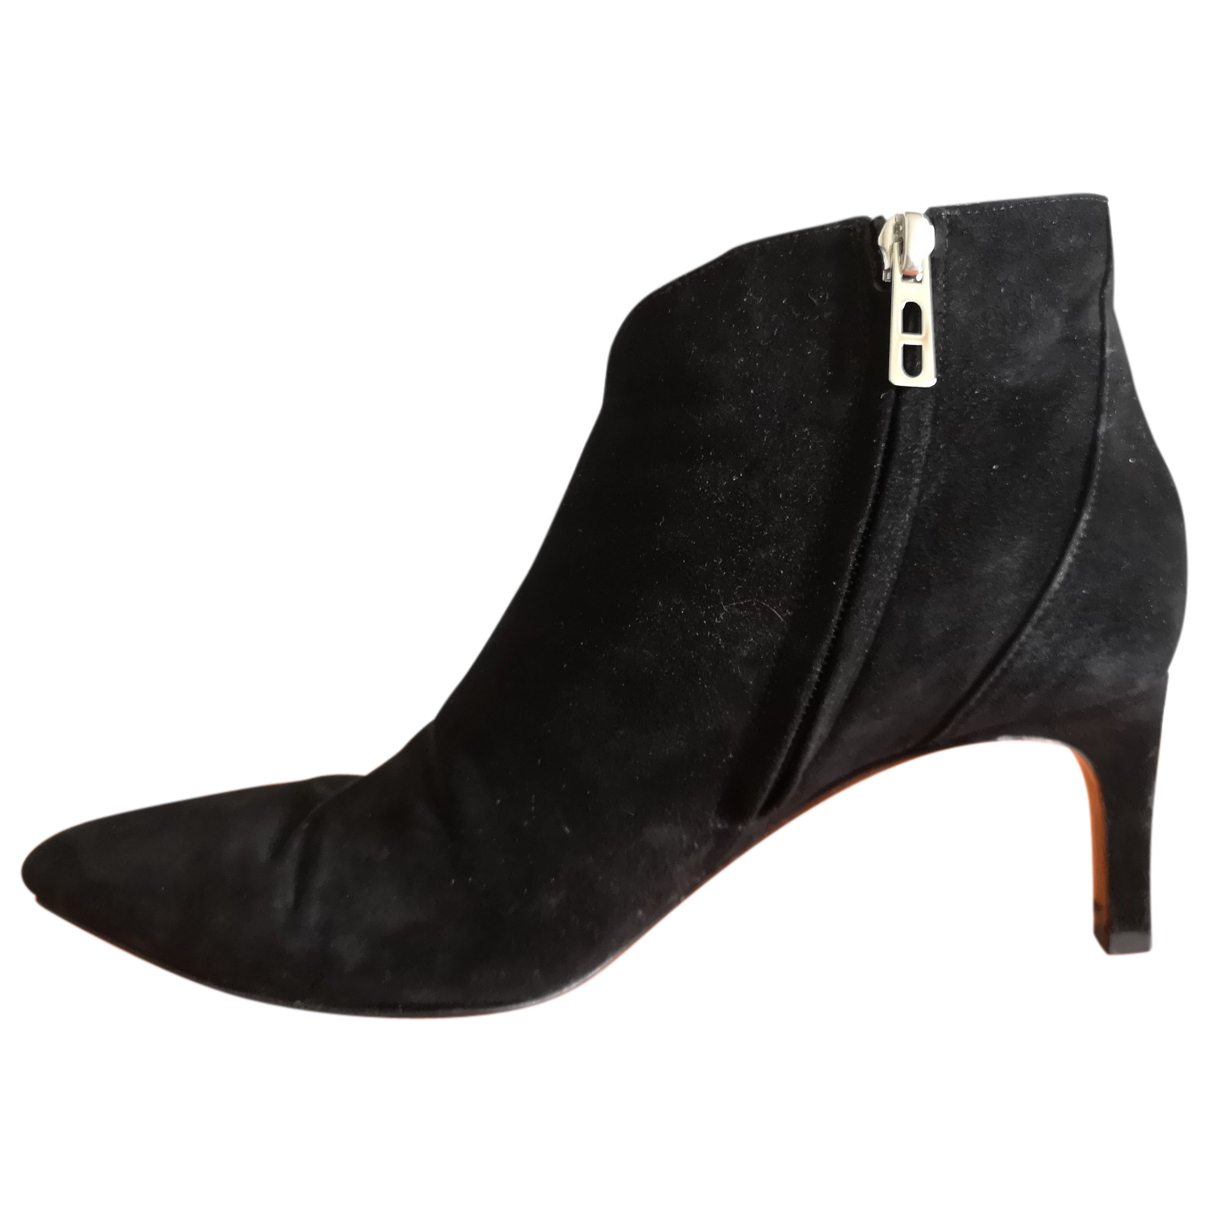 Hermès N Black Suede Ankle boots for Women 37 EU